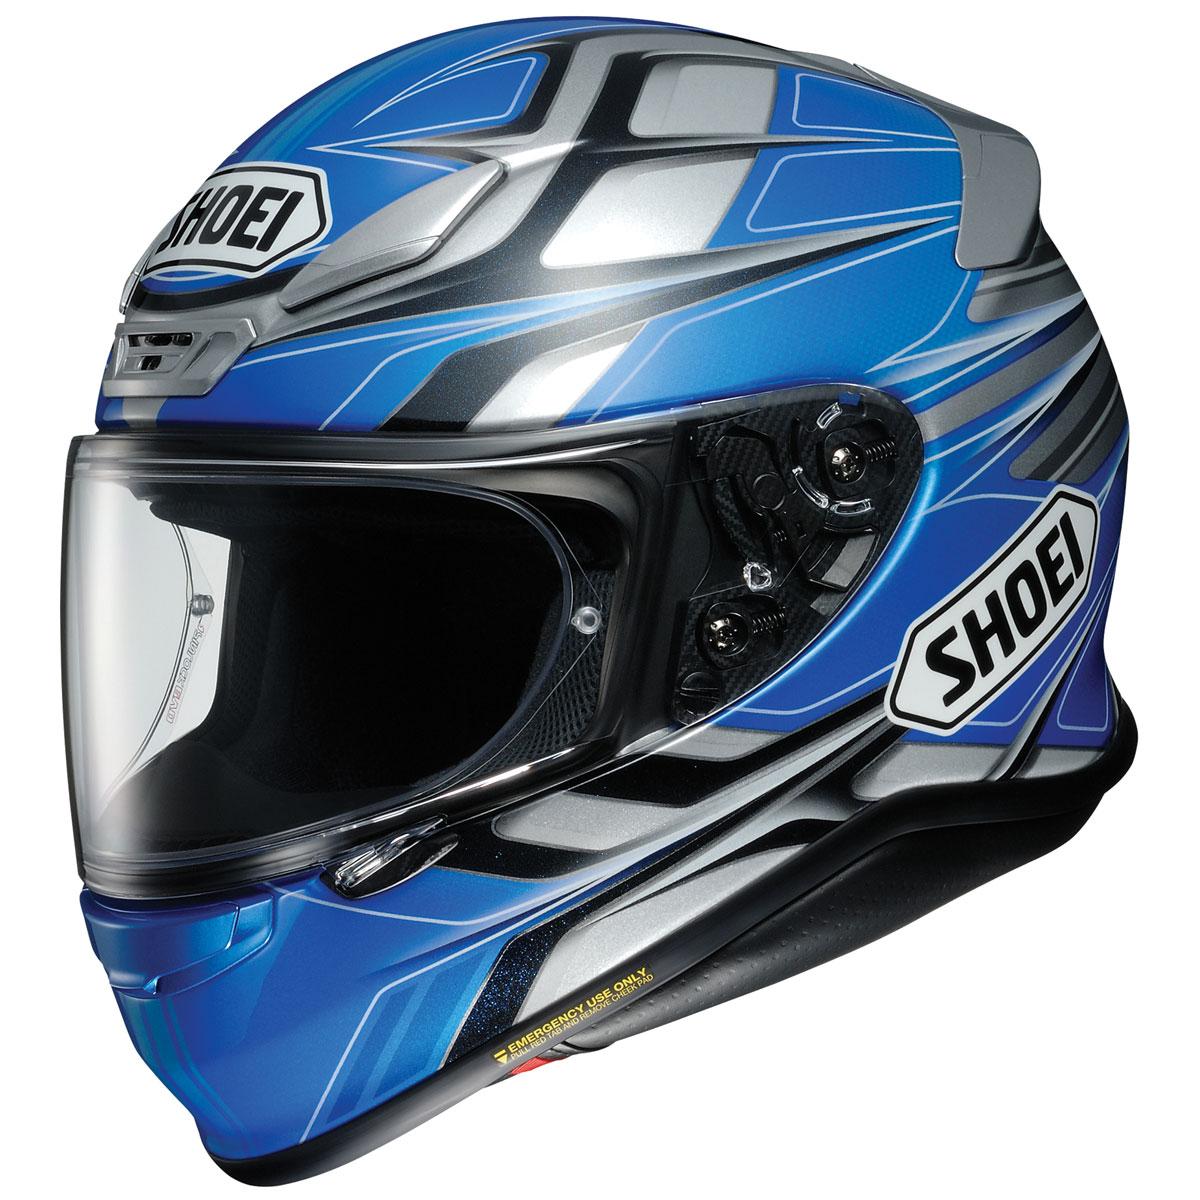 Shoei RF-1200 Rumpus Blue/Gray Full Face Helmet